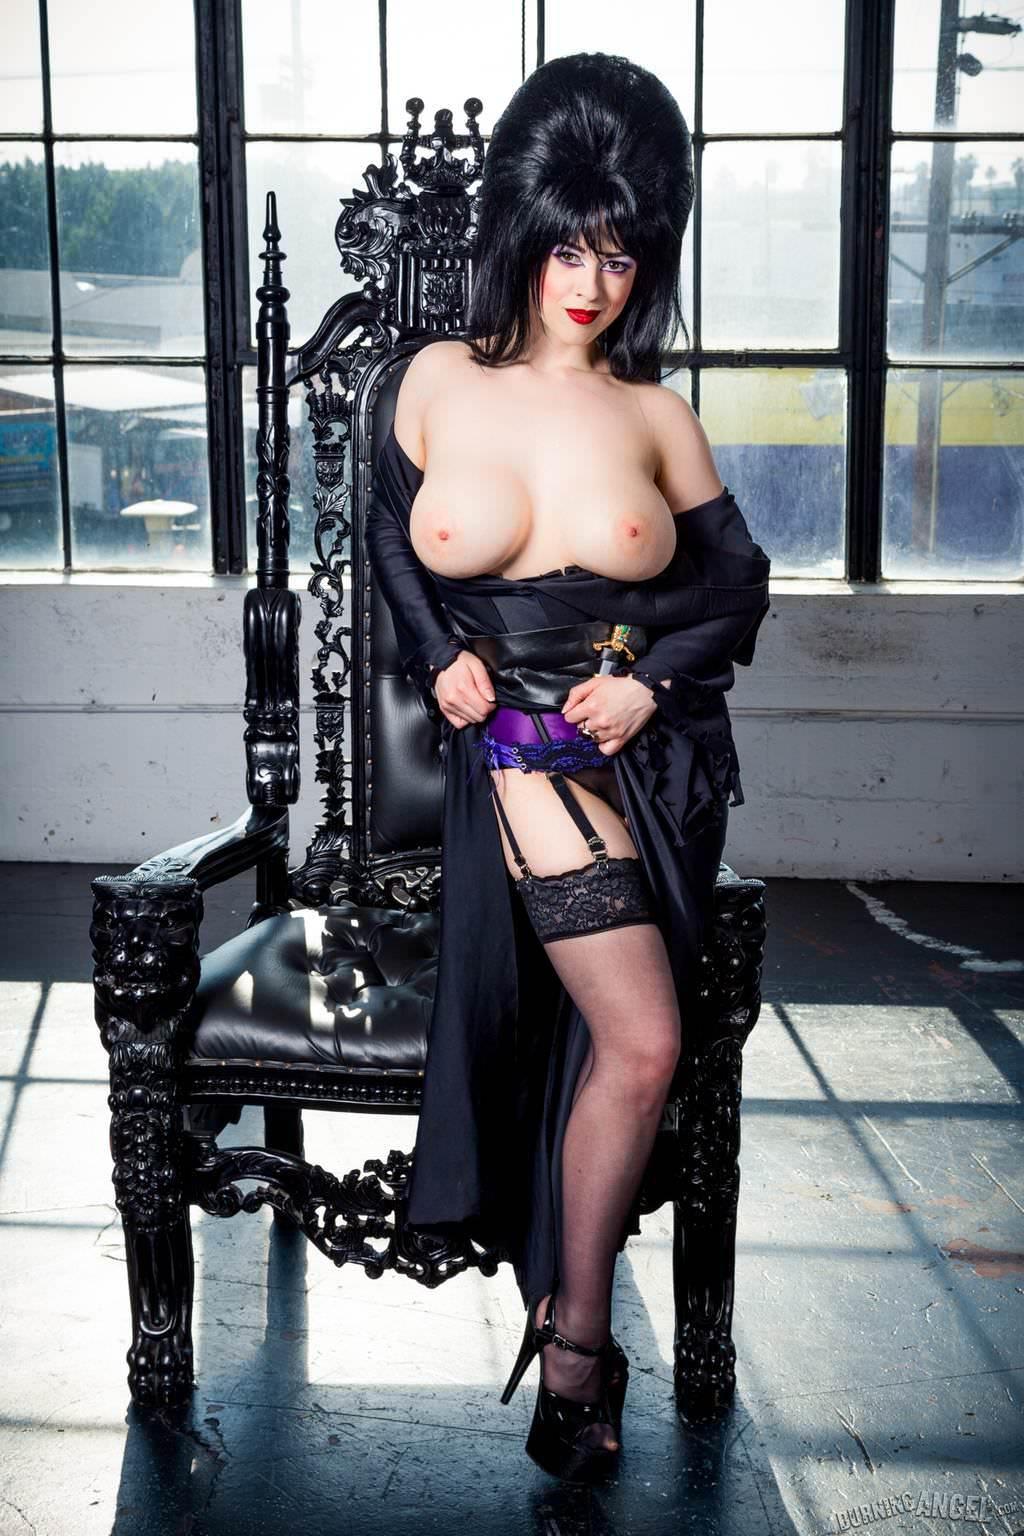 Larkin Love As Misress Elvira